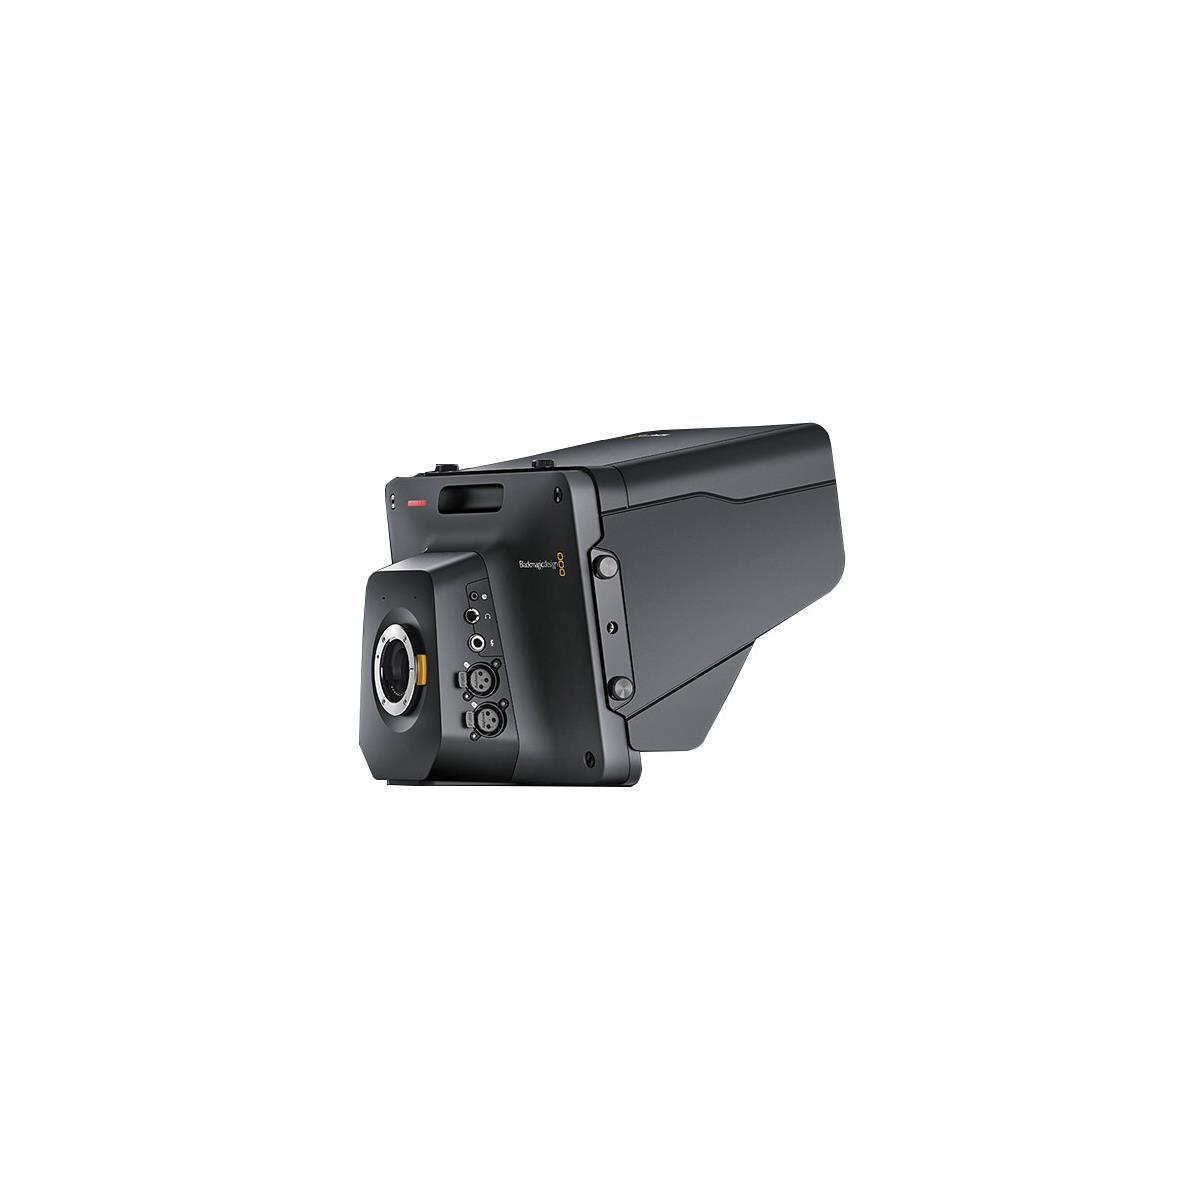 Blackmagic Releases Portable And Versatile Pro Video Gear